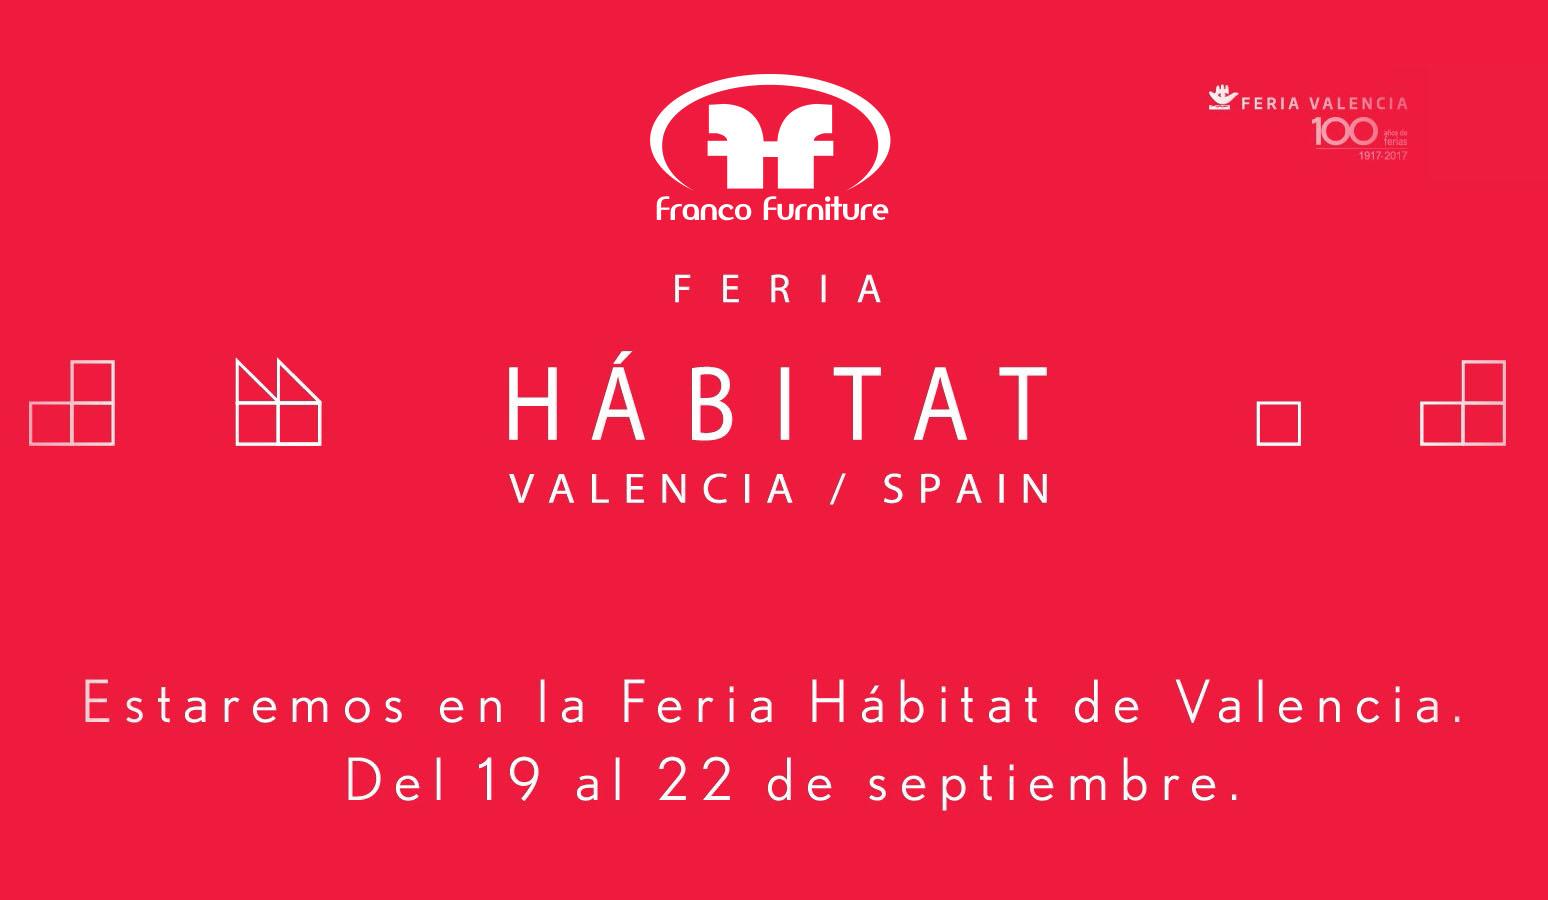 Feria Habitat Valencia 2017 Franco Furniture